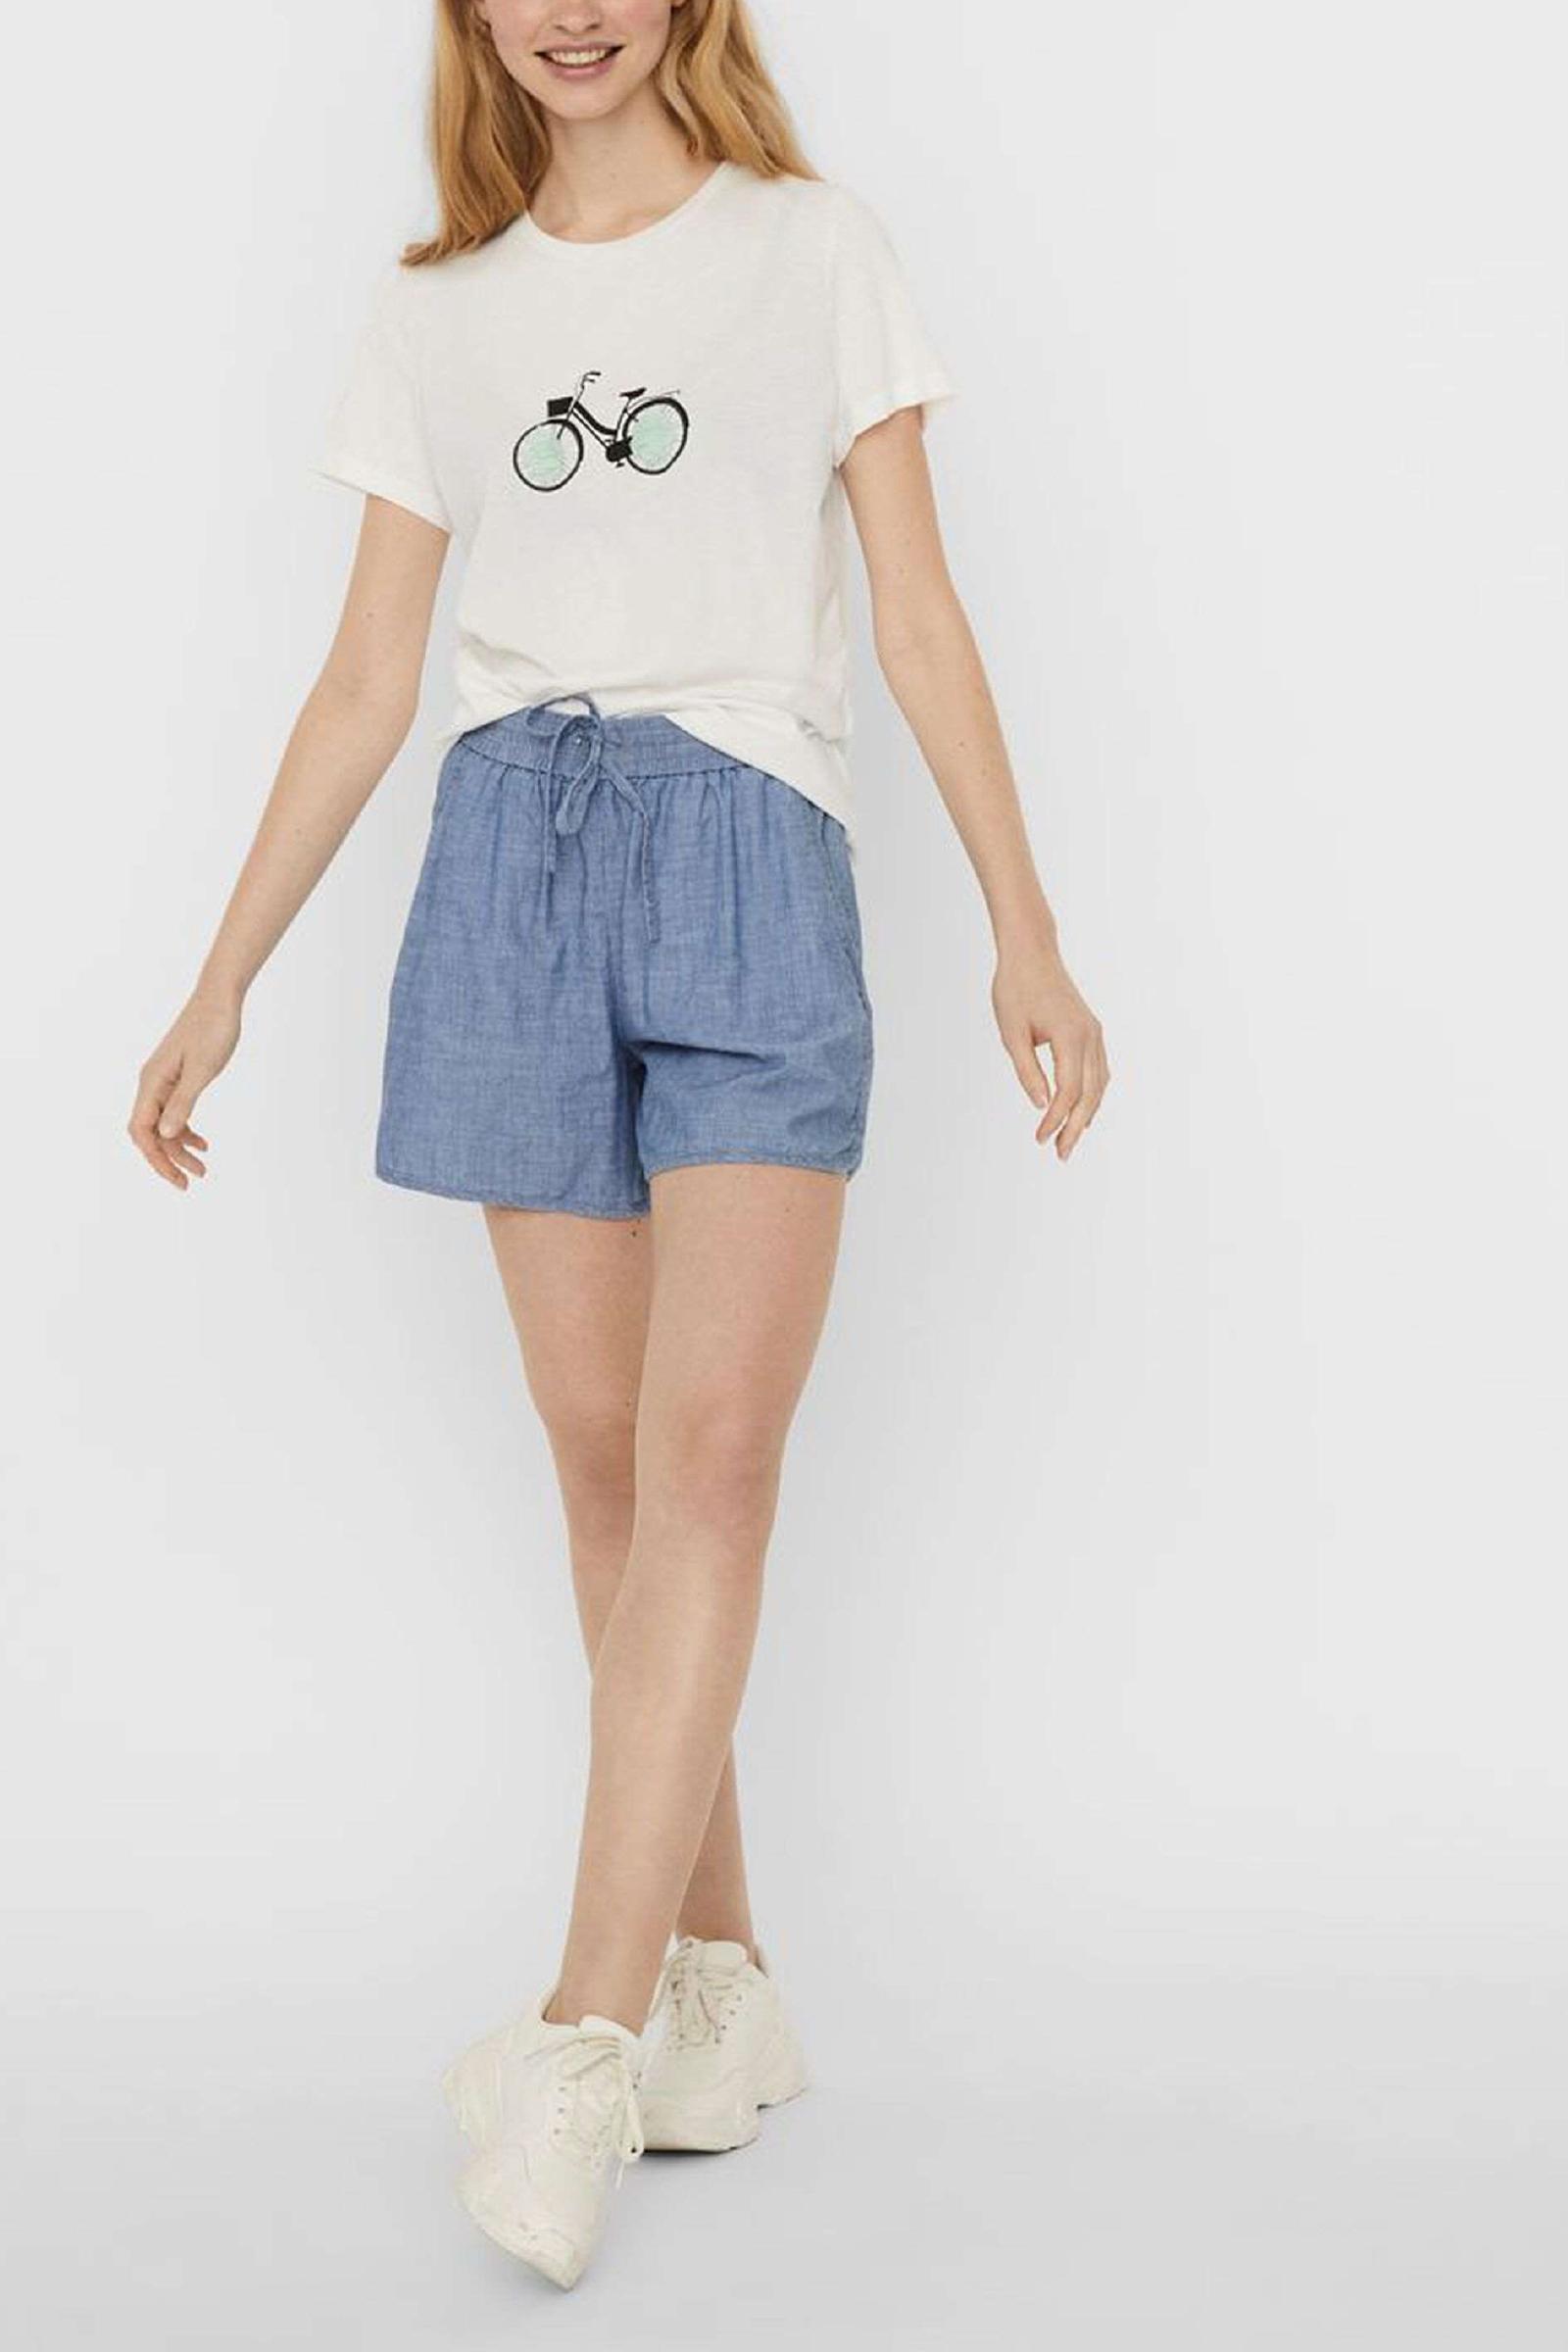 VERO MODA Women's T-Shirt VERO MODA   T-Shirt   10244391Print-BICYCLE